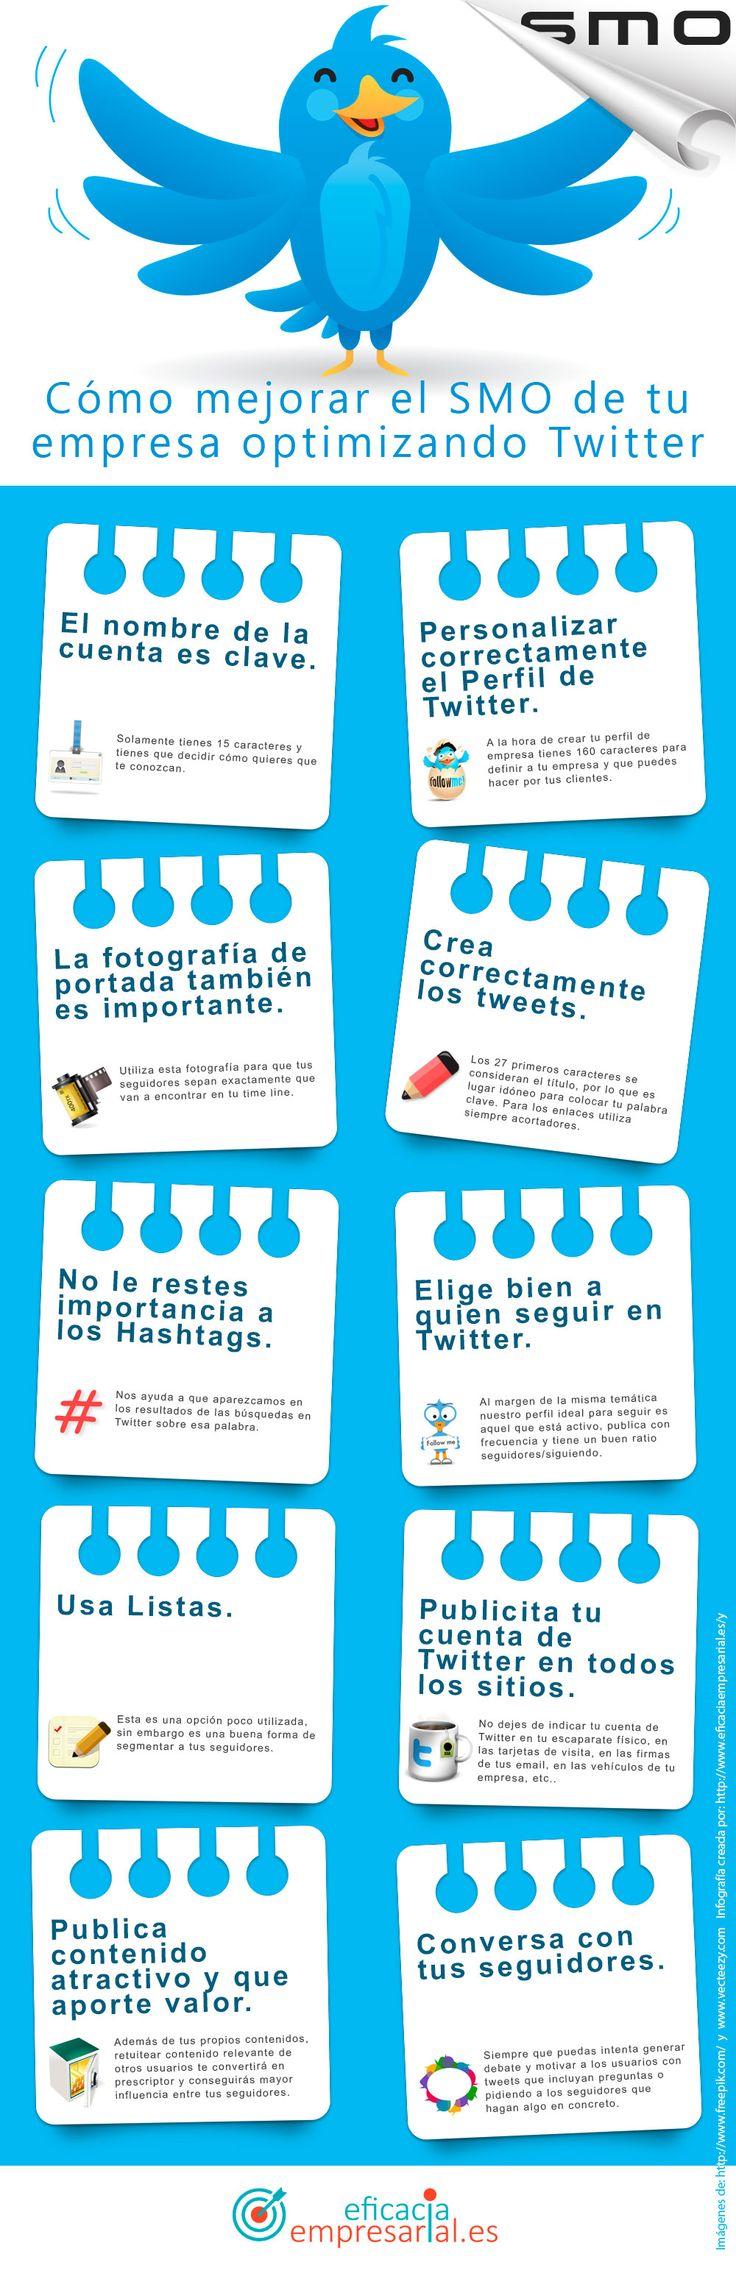 Optimiza el SMO de tu empresa optimizando Twitter #infografia